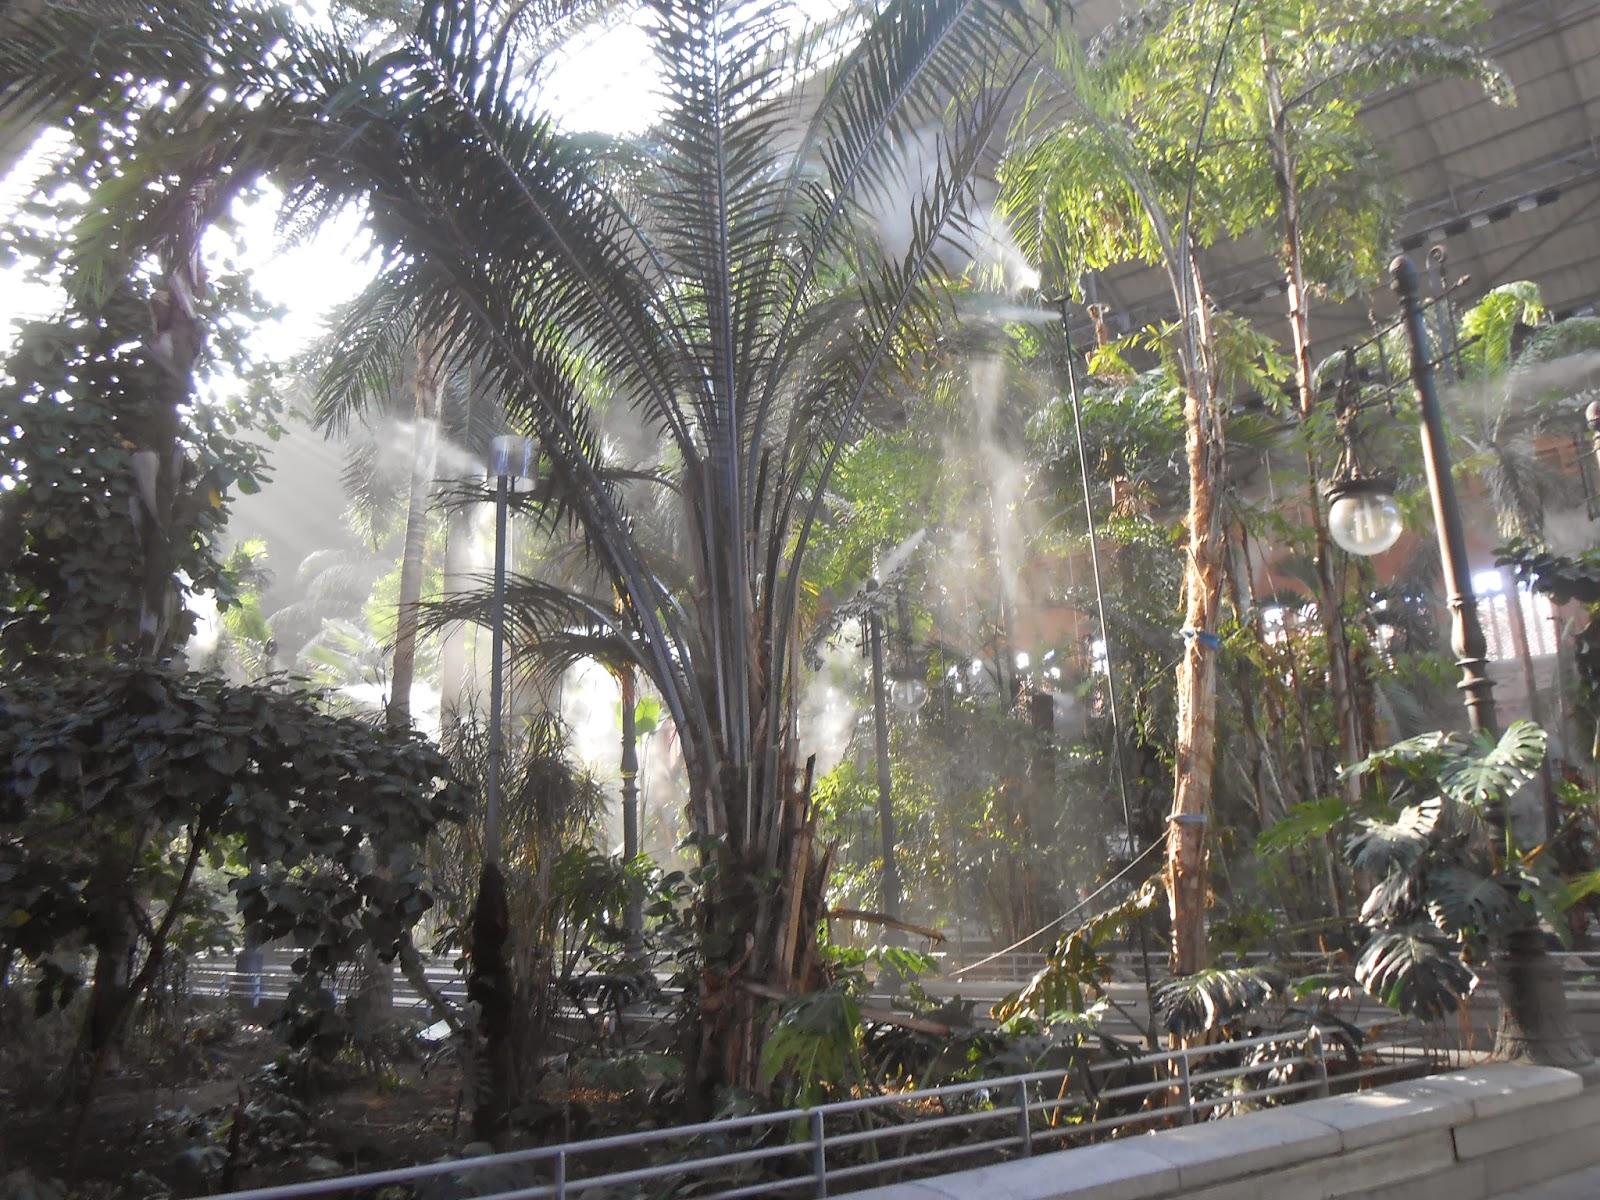 Madrid stazione atocha renfe giardino botanico - Giardino verticale madrid ...